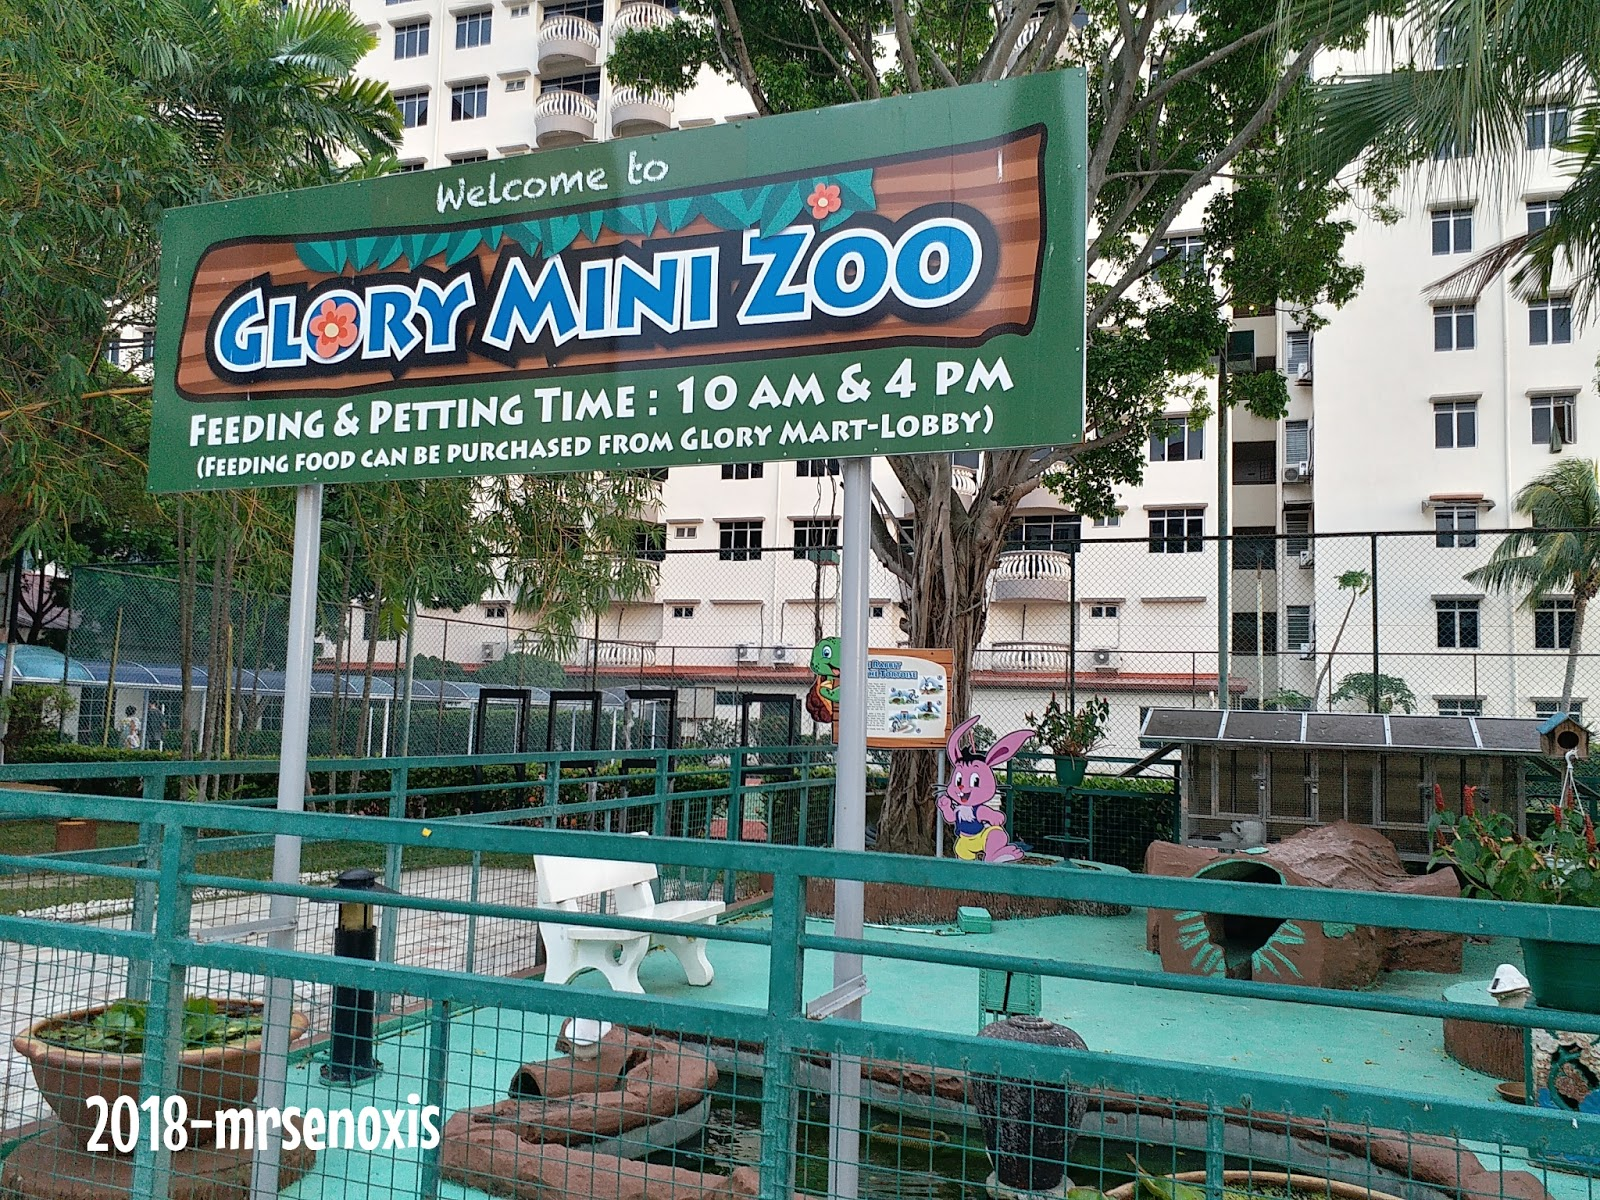 Dekat Glory Ni Ada Juga Mini Petting Zoo Tp Masa Dia La Kami X Masuk Pun Just Jenguk Saja Arnab Turtle Dan Burung Rasanya